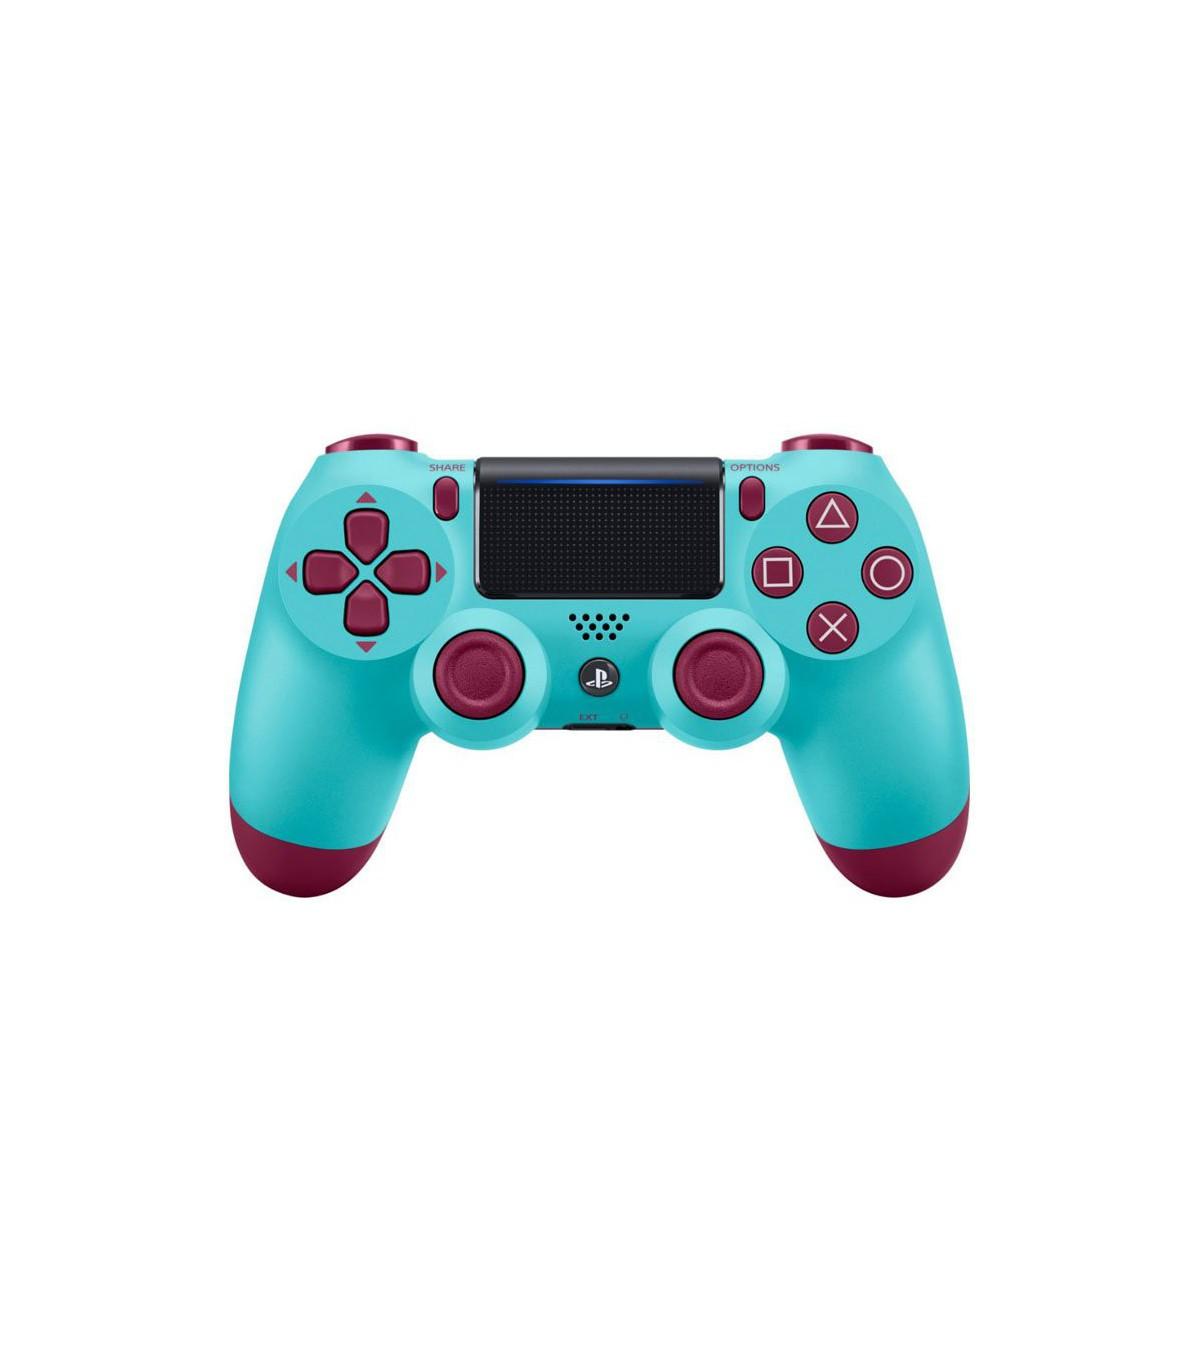 دسته بازی سری جدید رنگ آبی بلوبری DualShock 4 Berry Blue Slim Controller